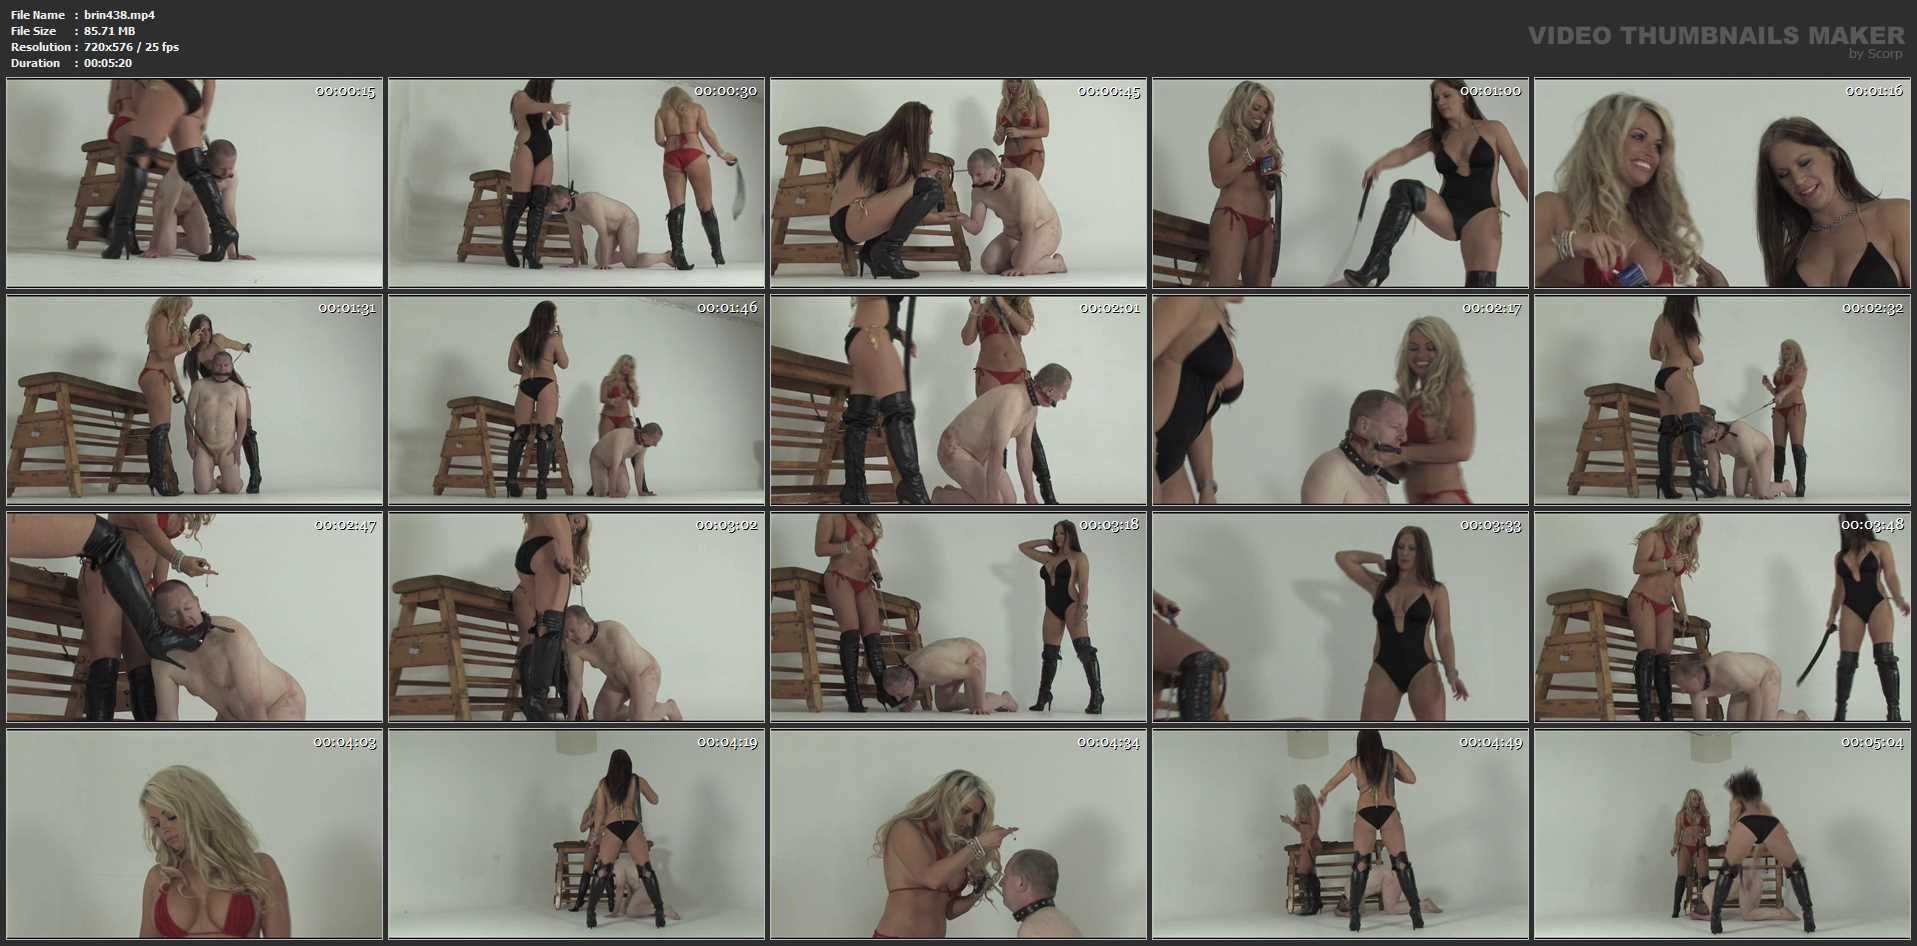 Ashleigh Embers, Brooke Lee In Scene: Bikini Terror Part 2 - THEBRITISHINSTITUTION - SD/576p/MP4